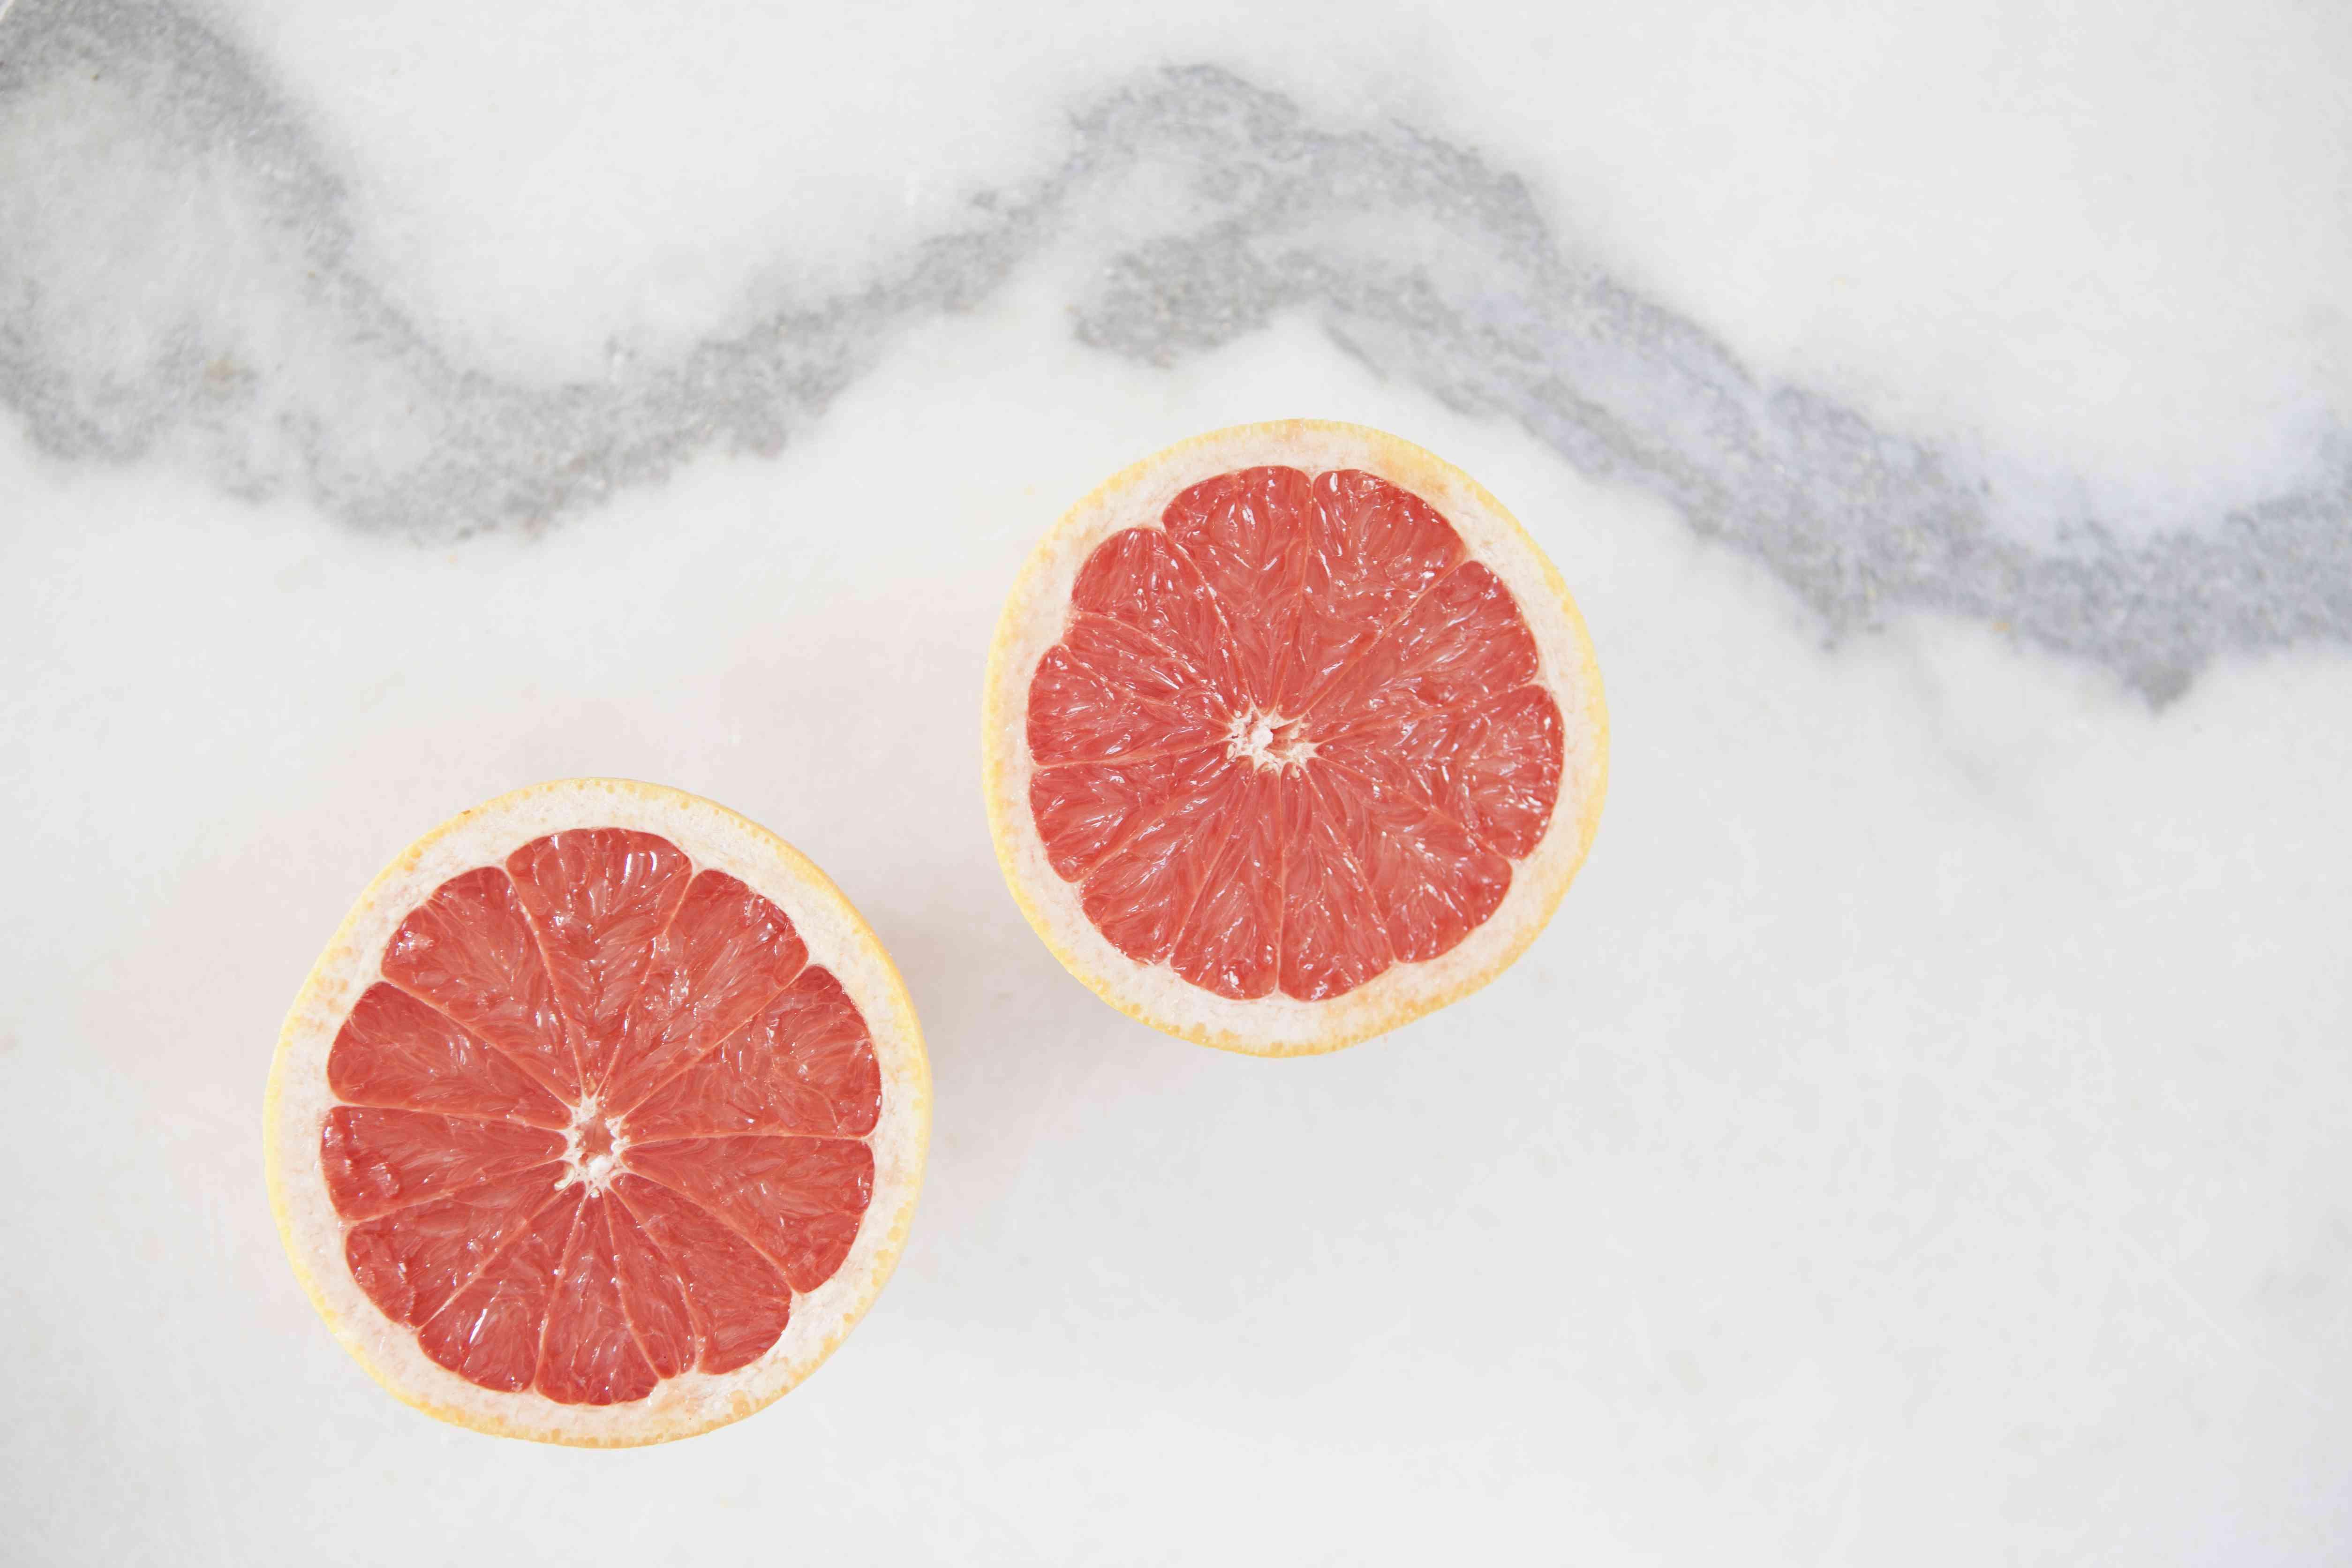 Directly above shot of sliced grapefruit on white background